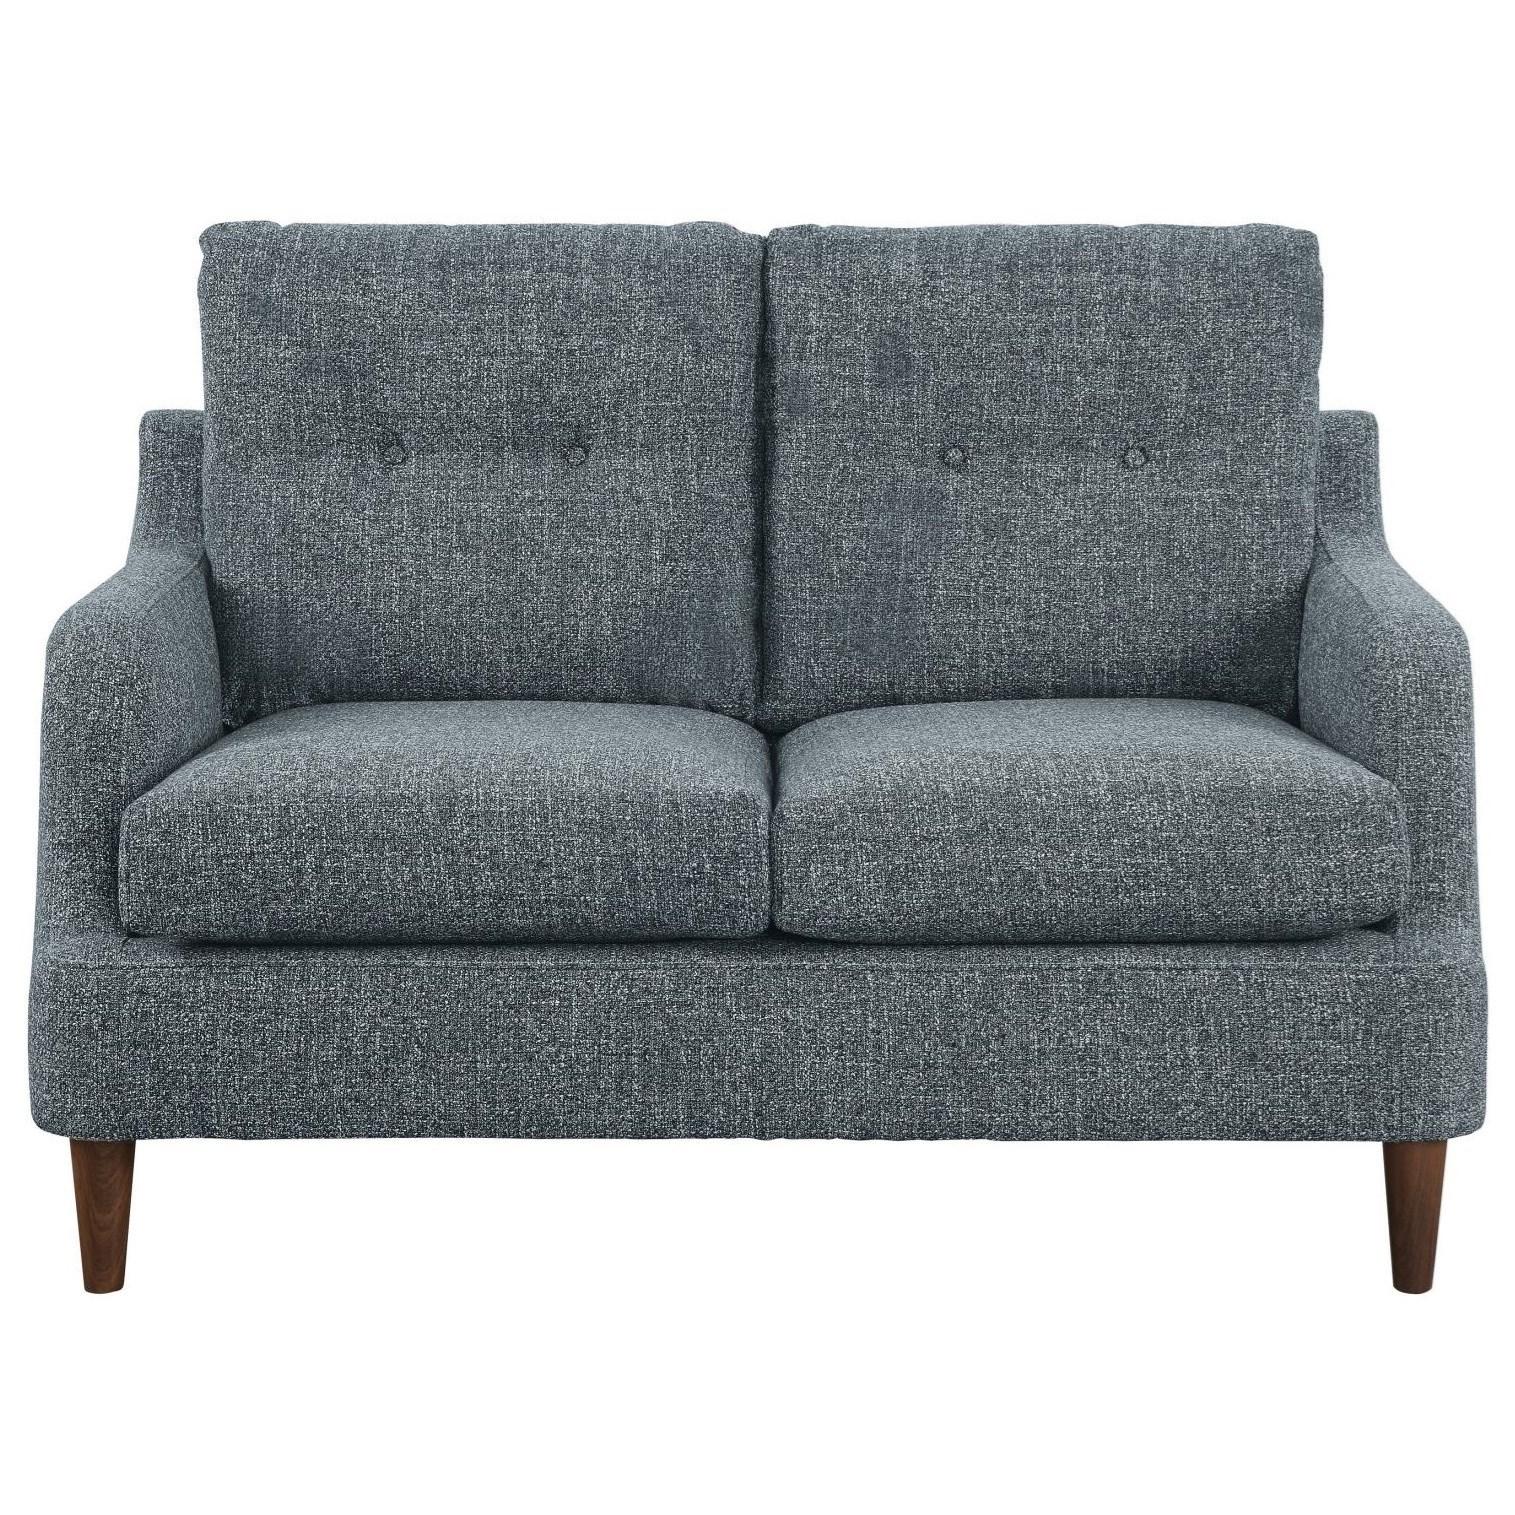 Cagle Love Seat by Homelegance at Corner Furniture